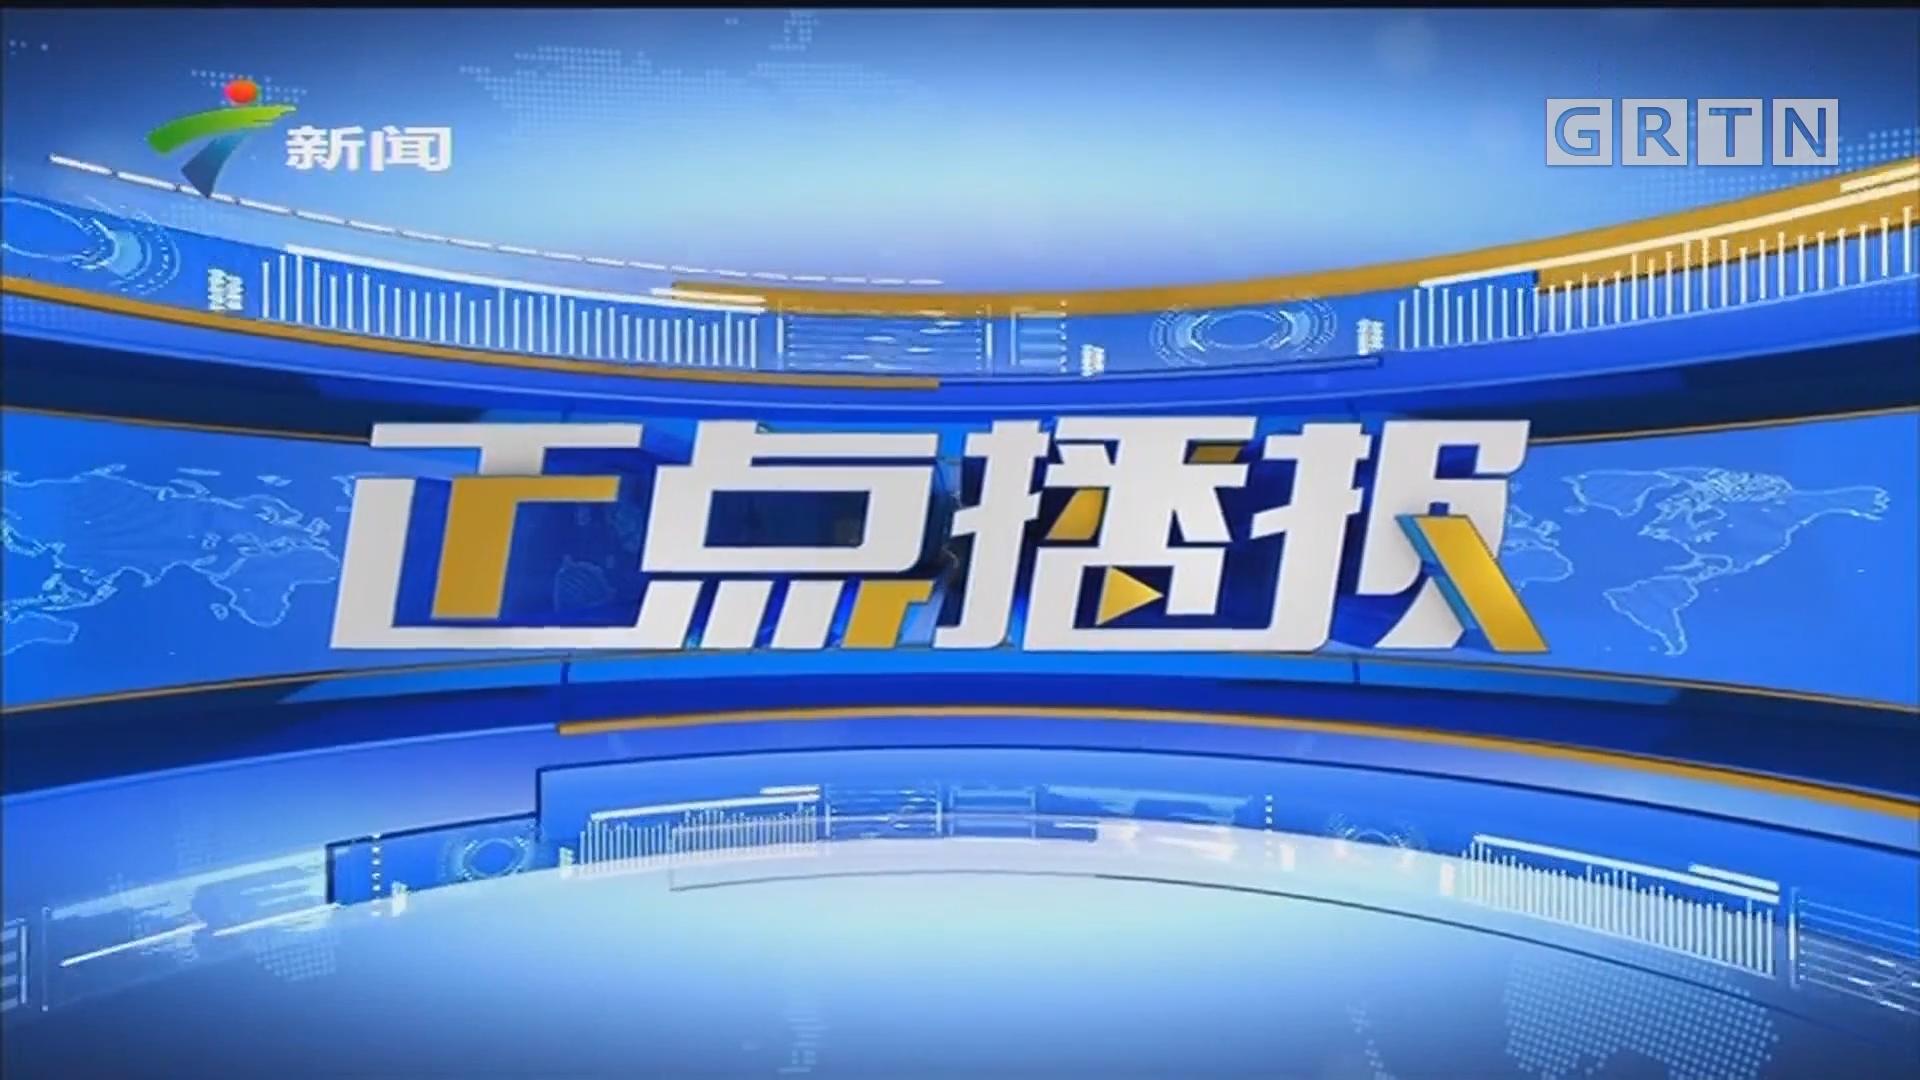 [HD][2019-11-16]正點播報:佛山:明年將推出300套共有產權住房